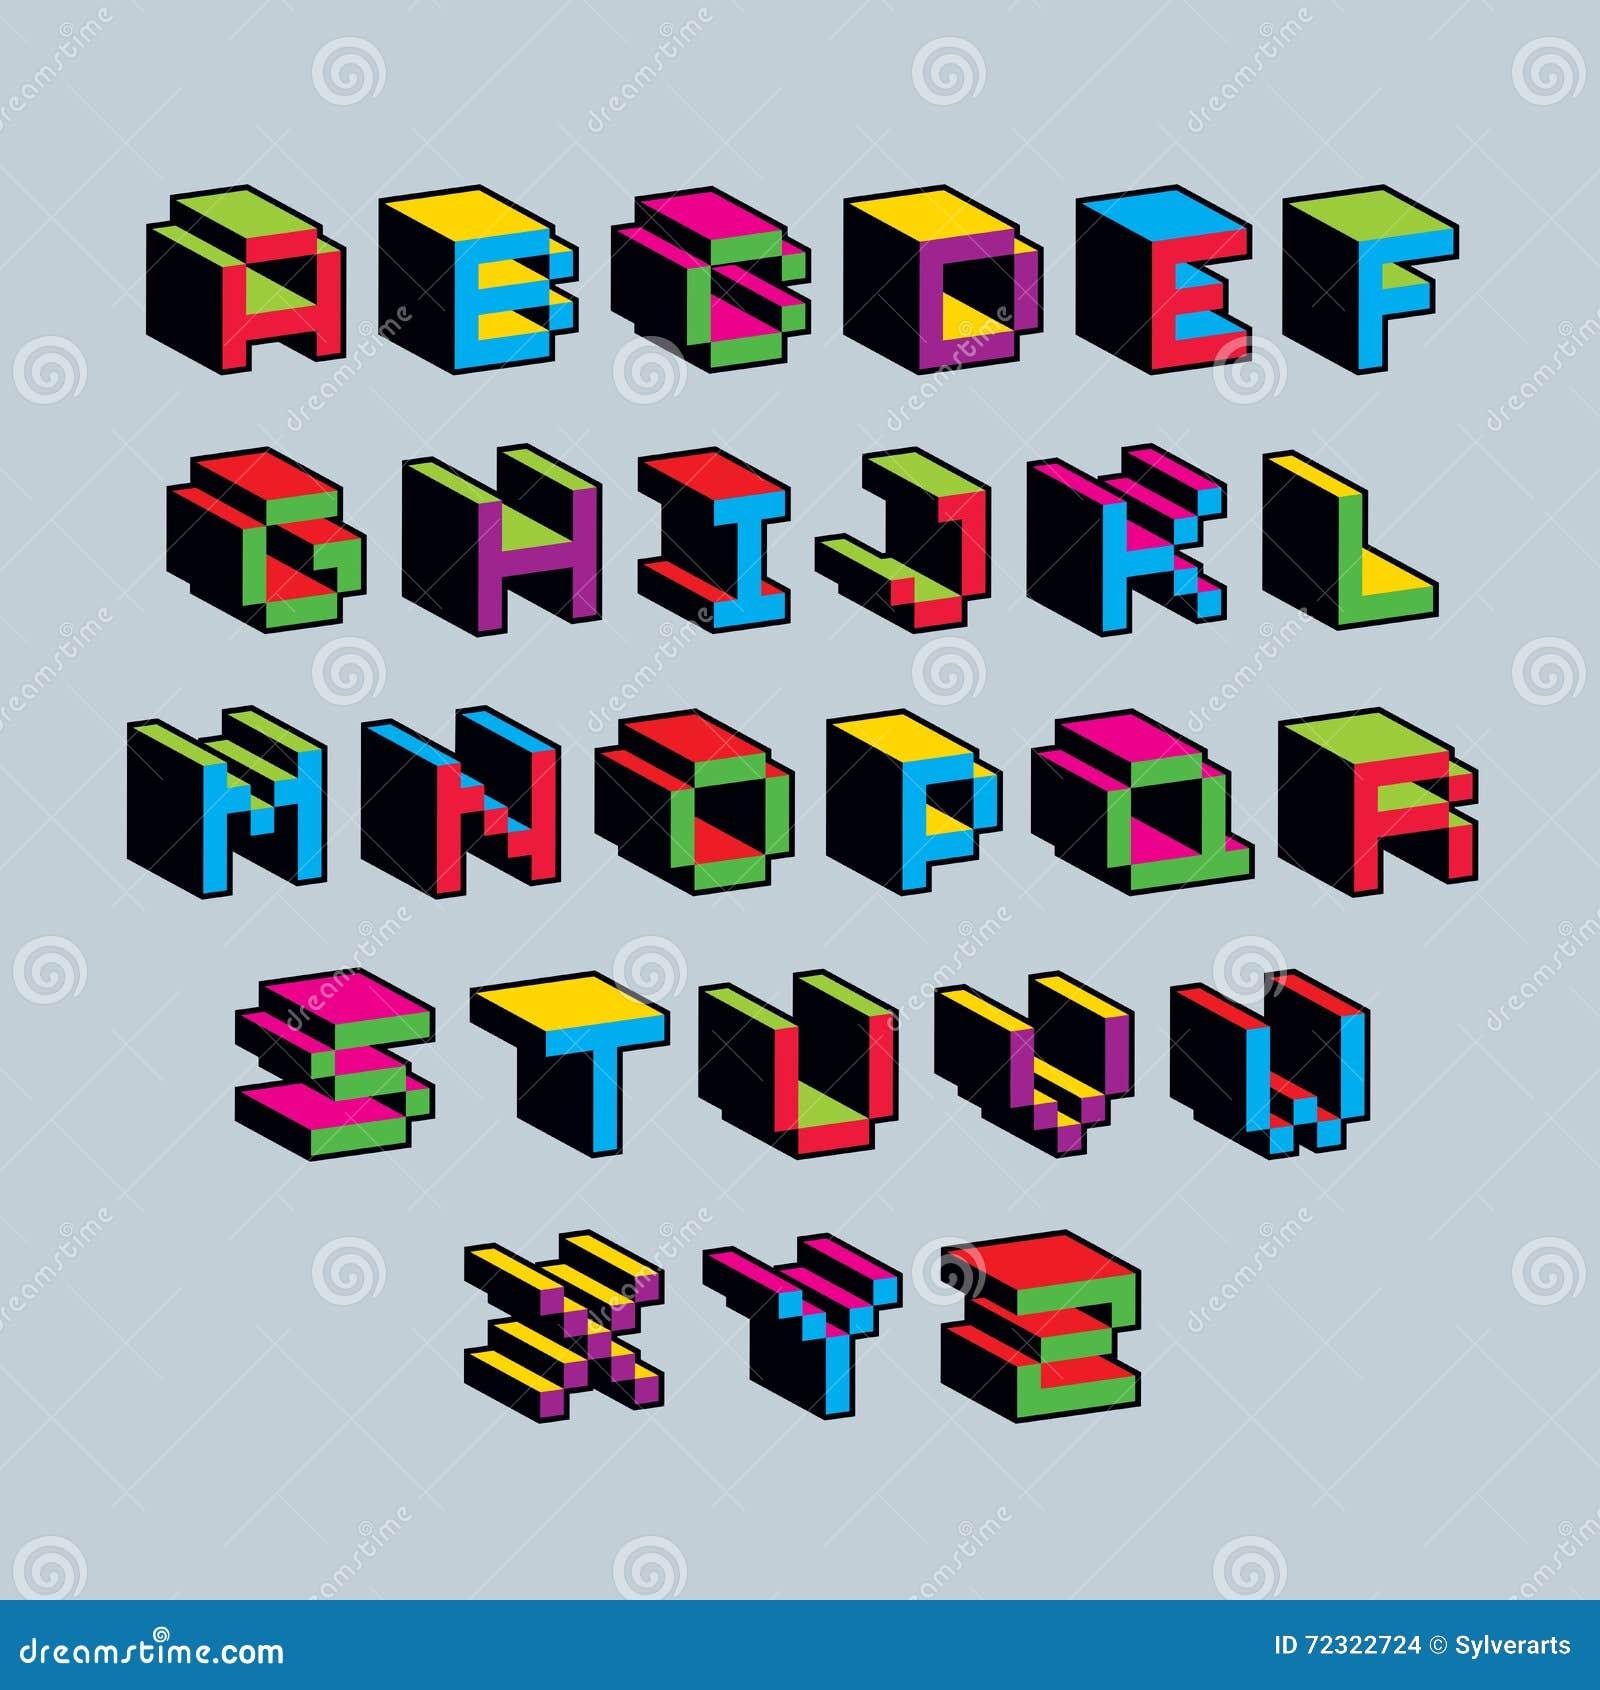 Vector Font, Typescript Created In 8 Bit Style. Pixel Art